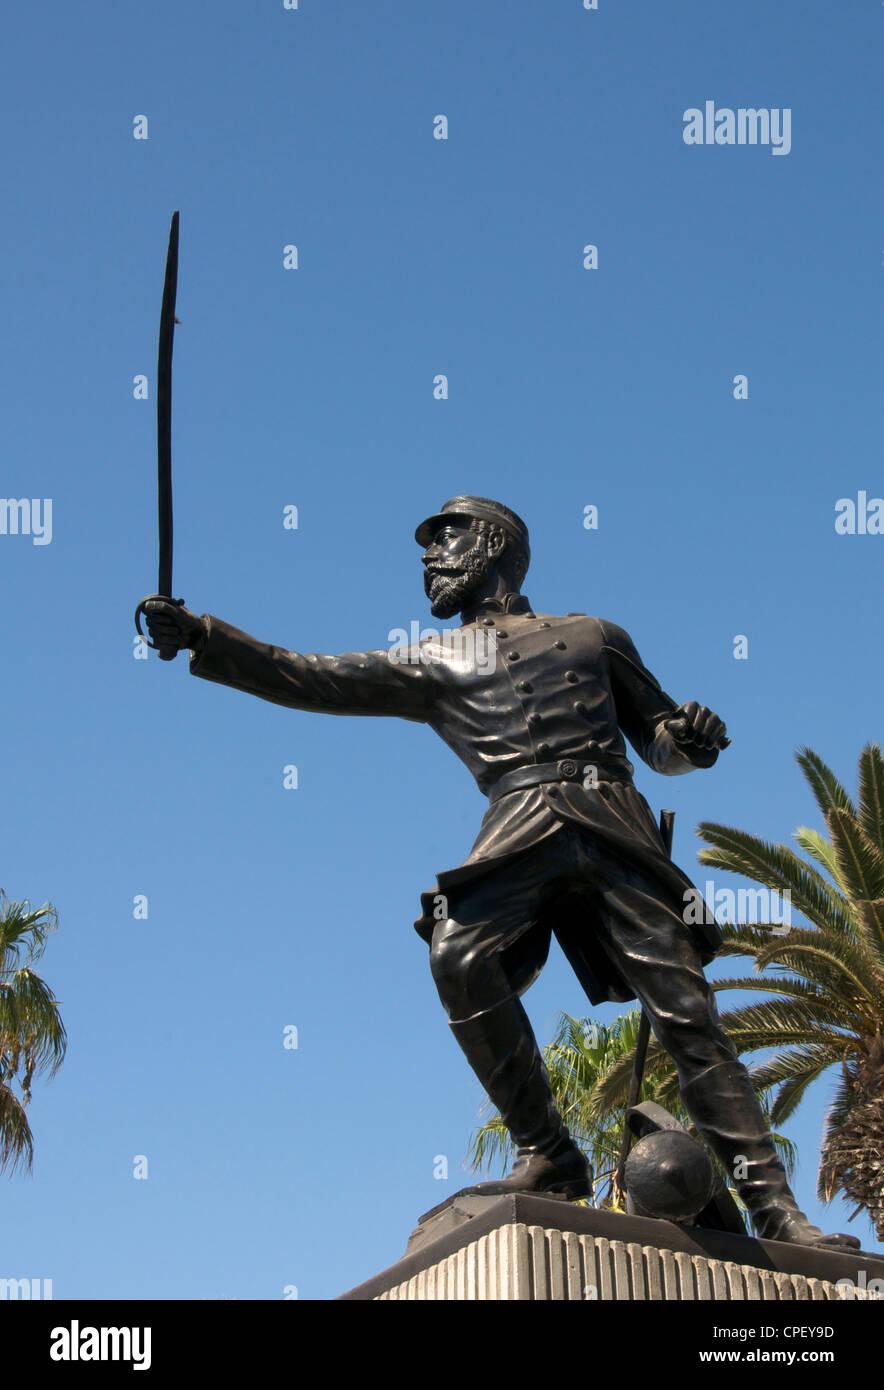 Statue Commander Juan San Martin 1880 - 1980 Arica Chile - Stock Image